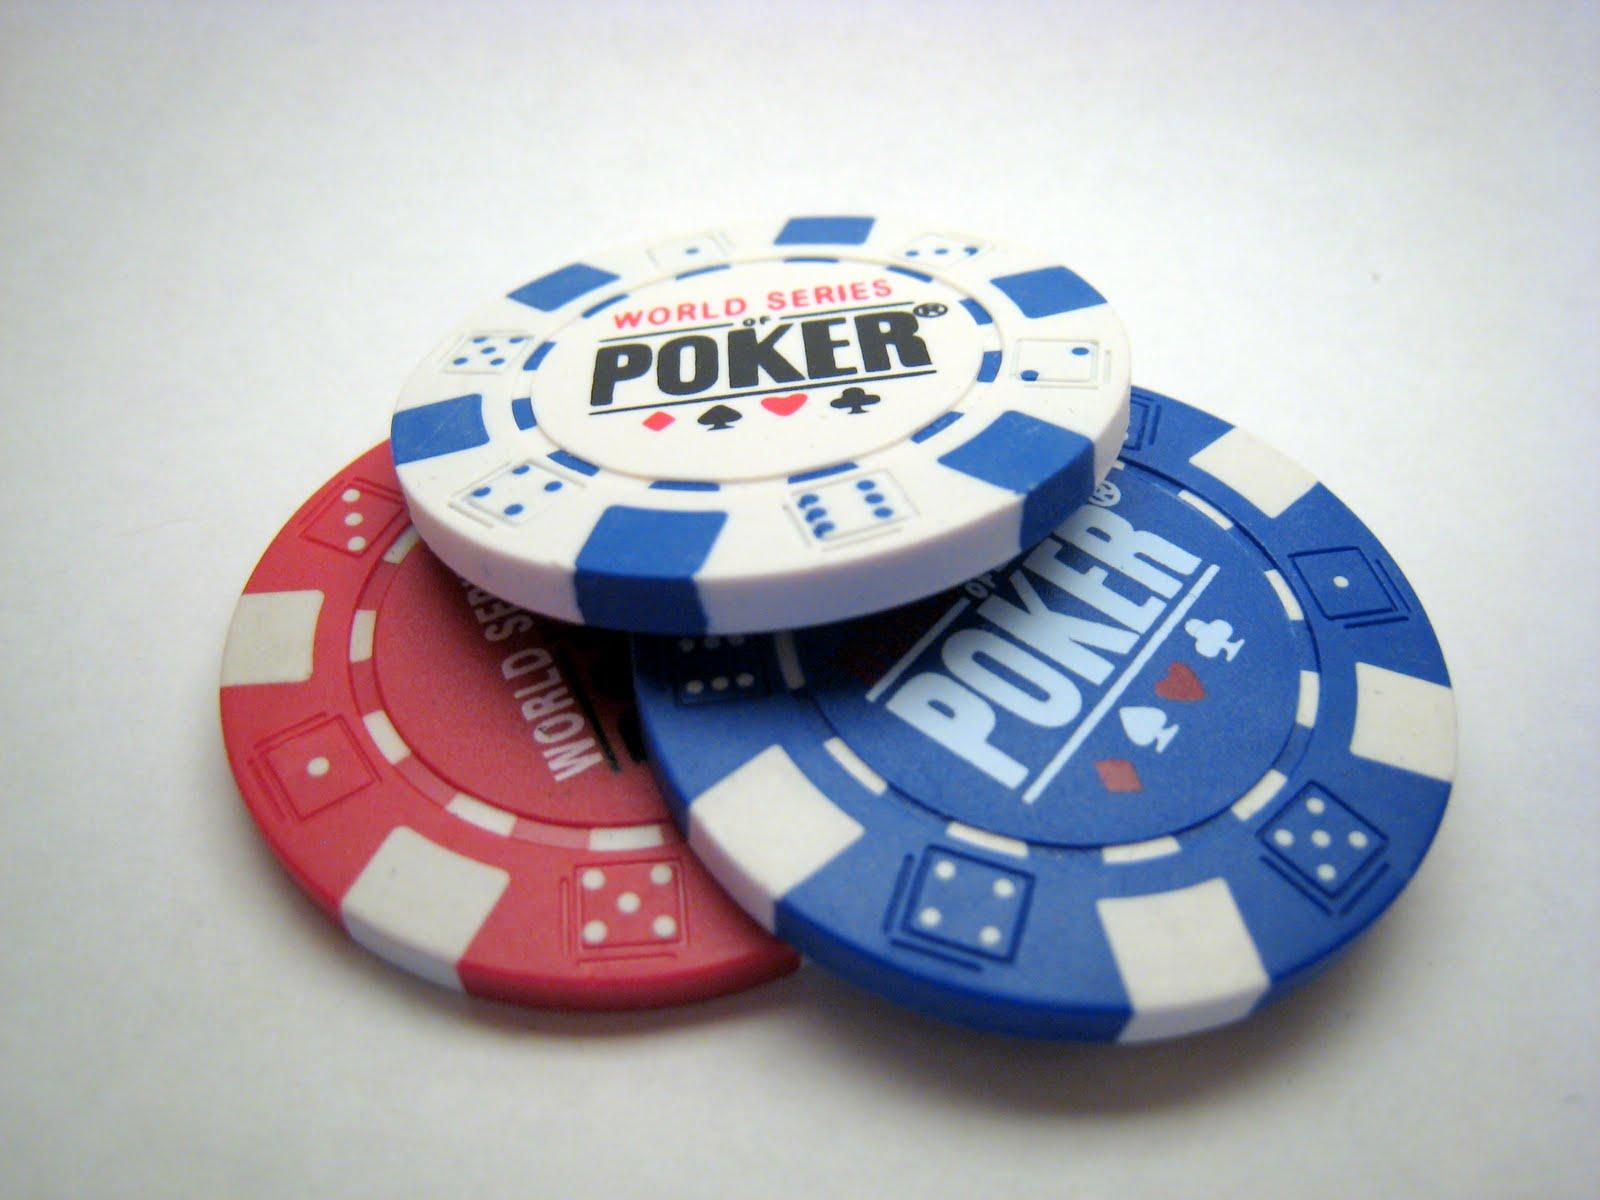 poker resimleri hd wallpapers - photo #15